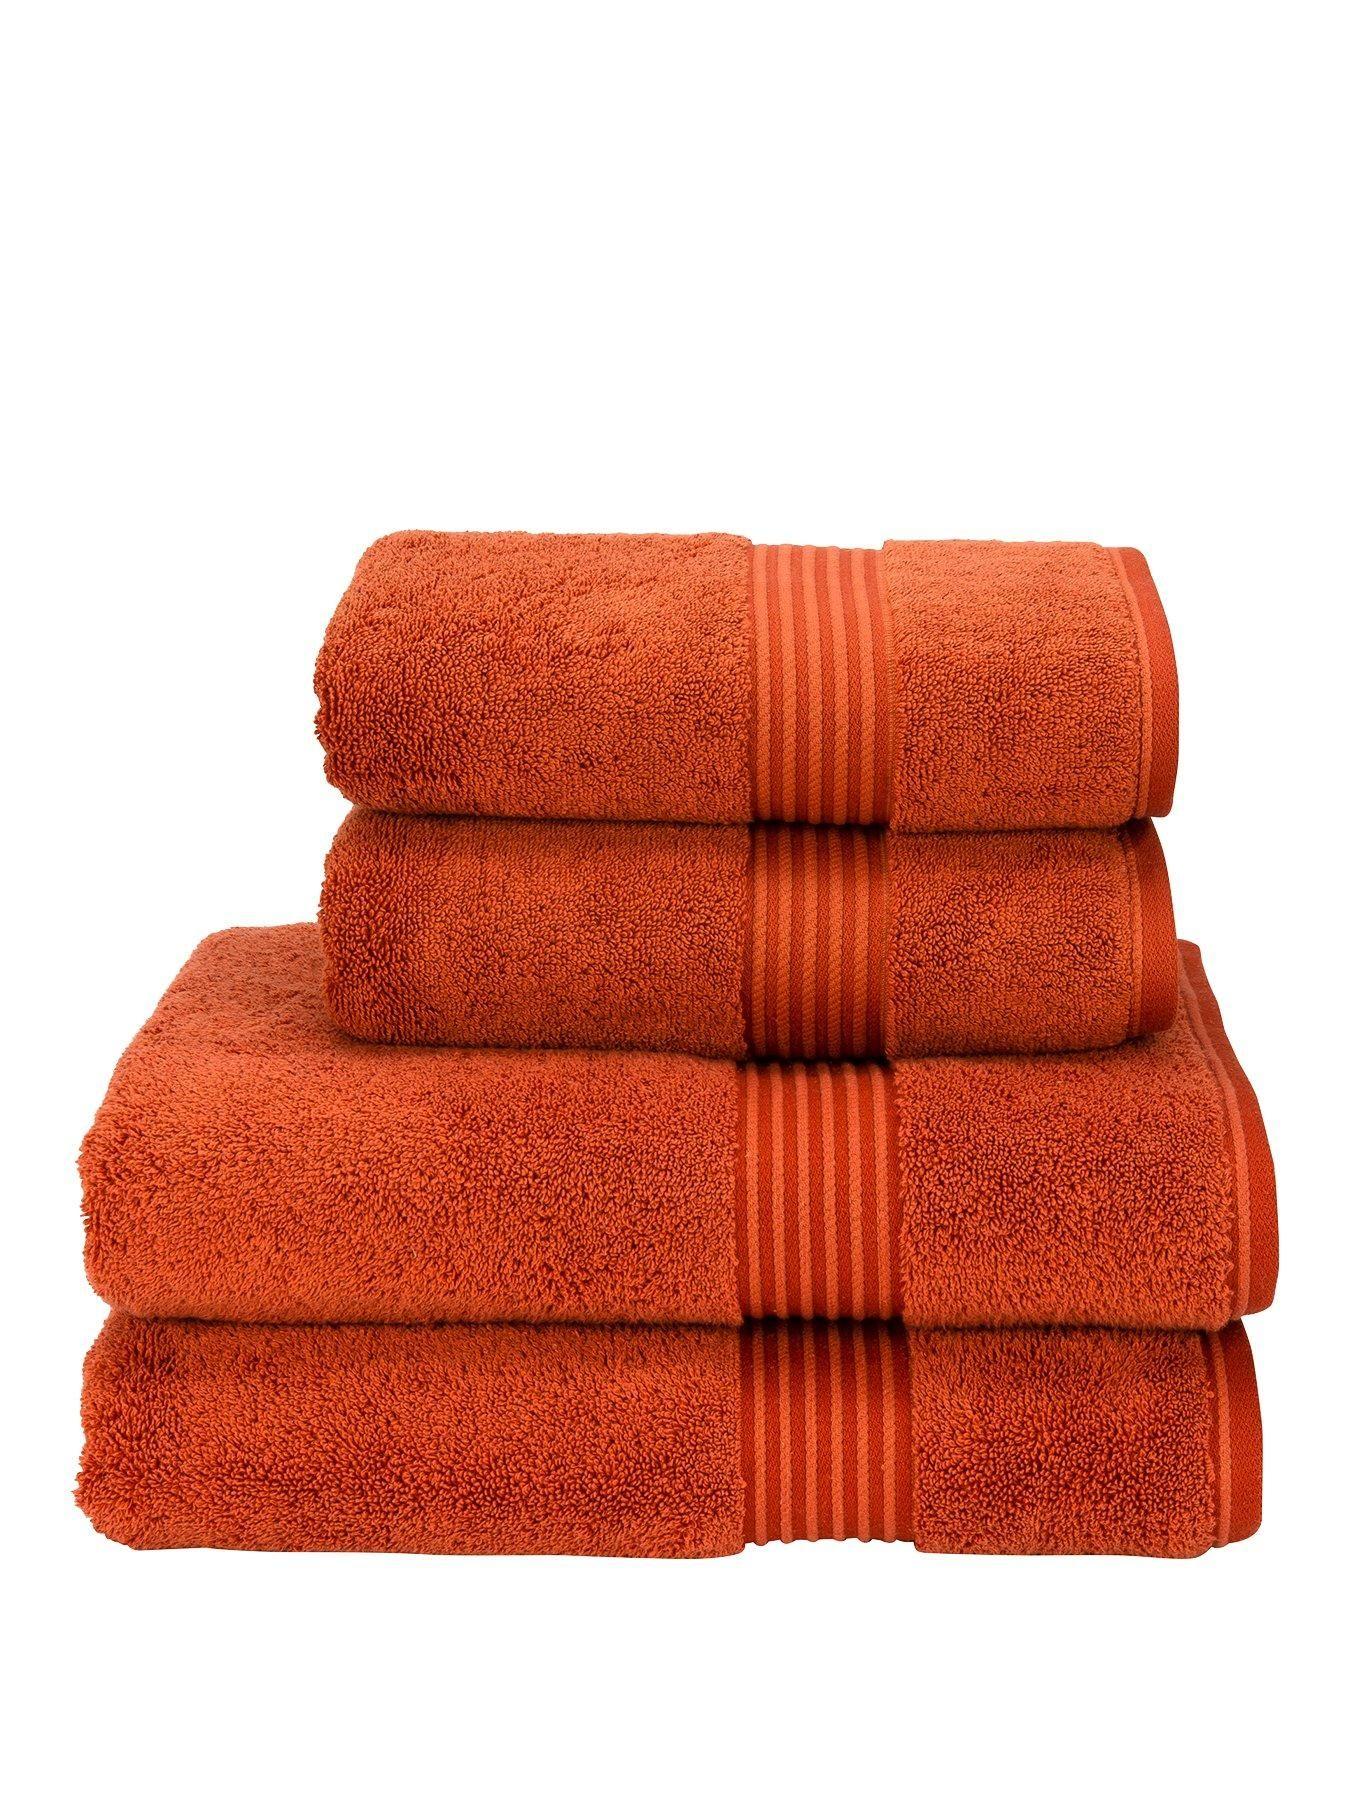 Supreme Hygro Supima Cotton Bath Towel Collection Paprika